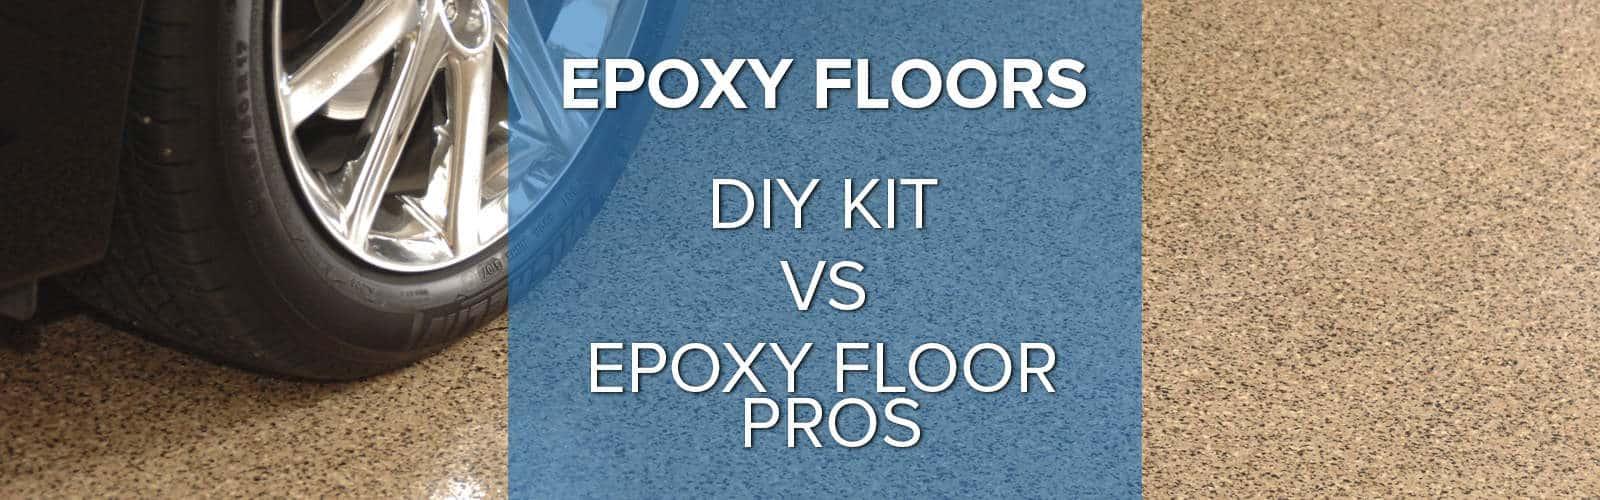 Floor Coating with DIY Epoxy Kits - Never, Ever